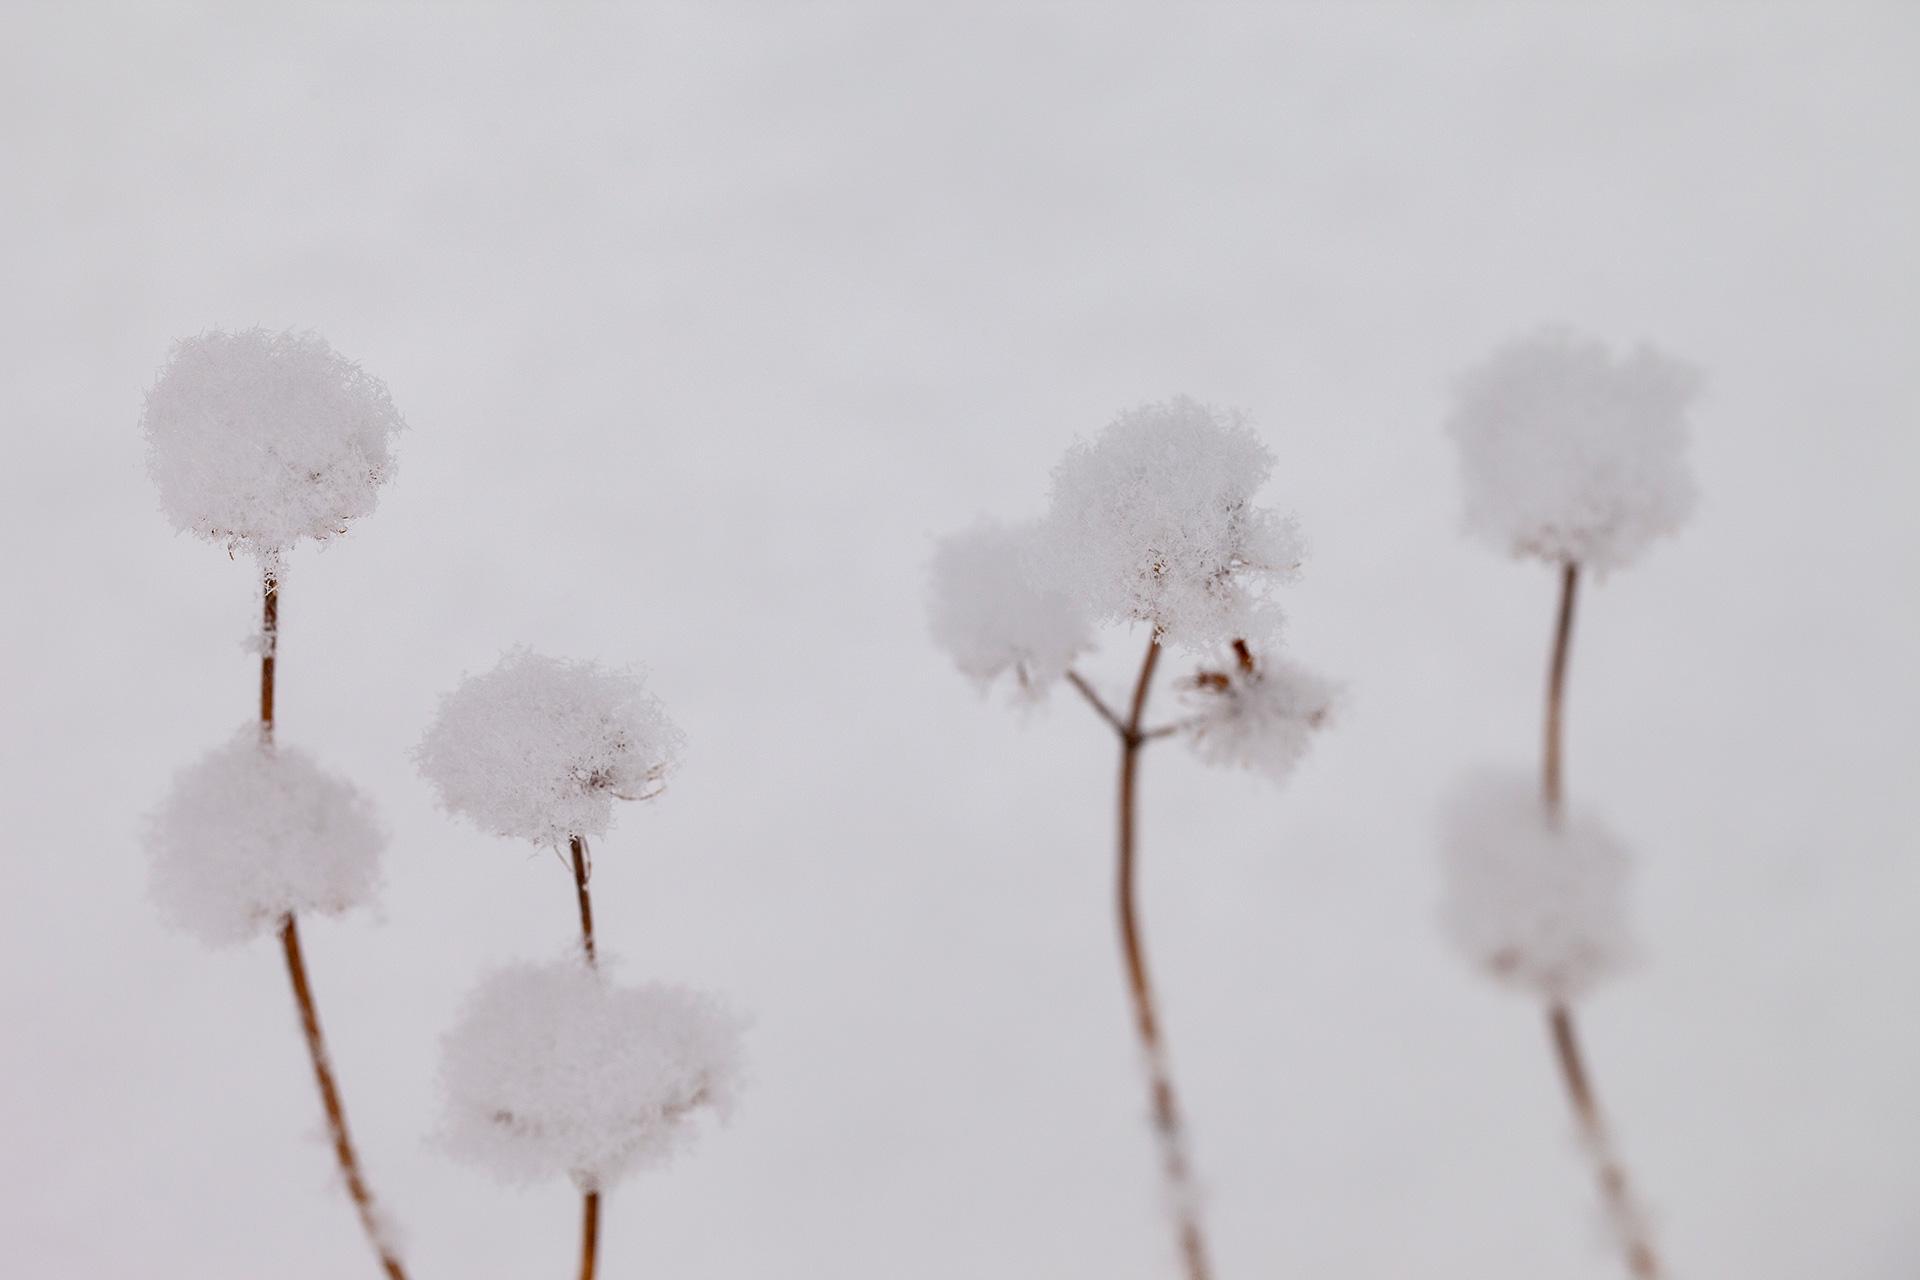 4855_Snowballs_1920.jpg